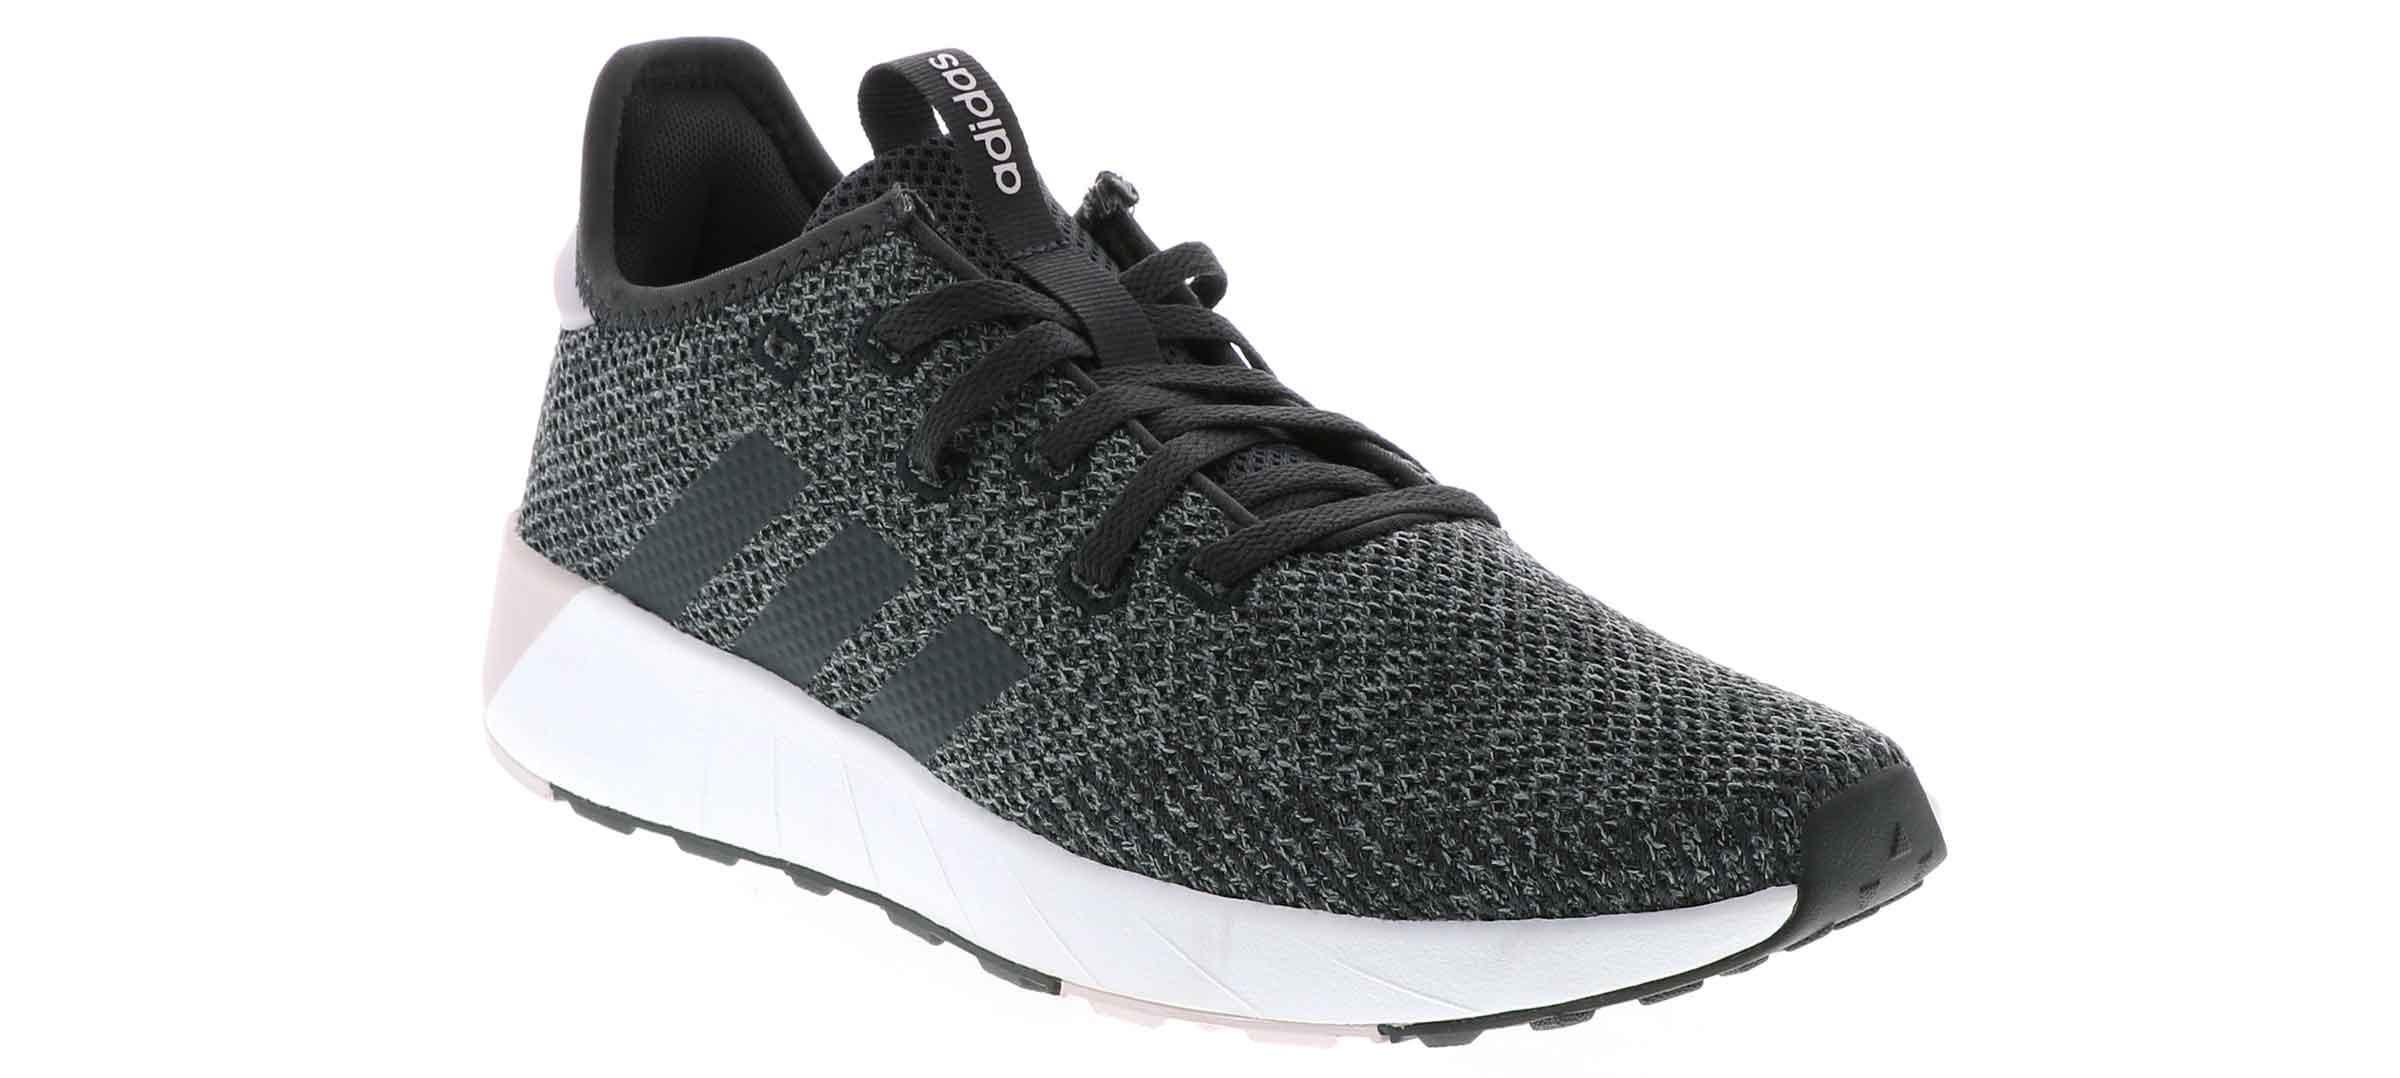 sports shoes c2a90 e3dc3 ADIDAS Women's Adidas Questar X womens athletics, running ...